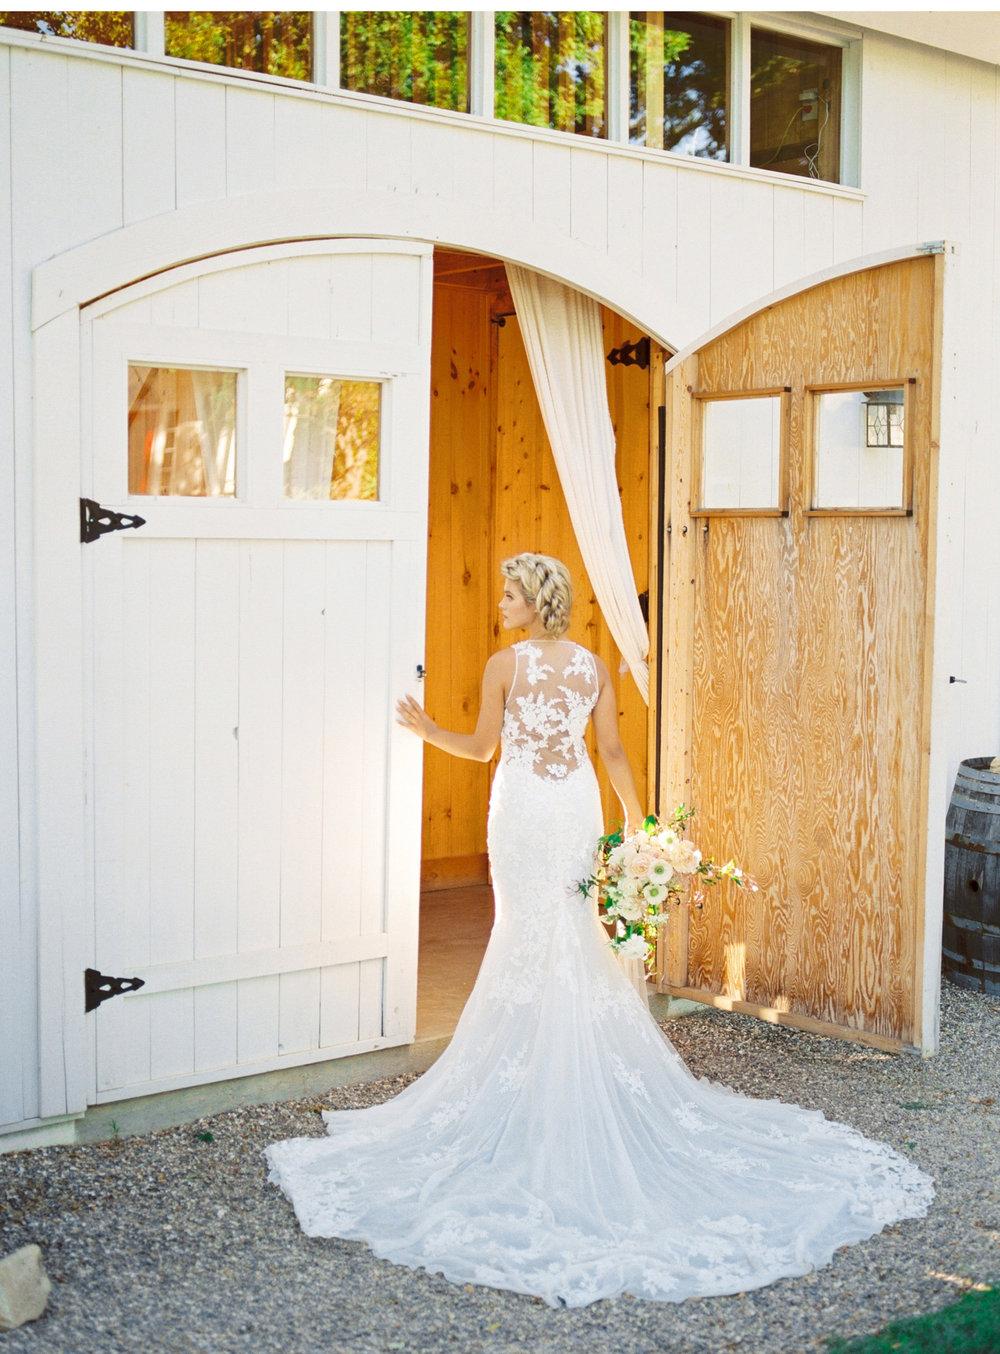 San-Luis-Obispo-Weddings-Natalie-Schutt-Wedding-Photography_14.jpg